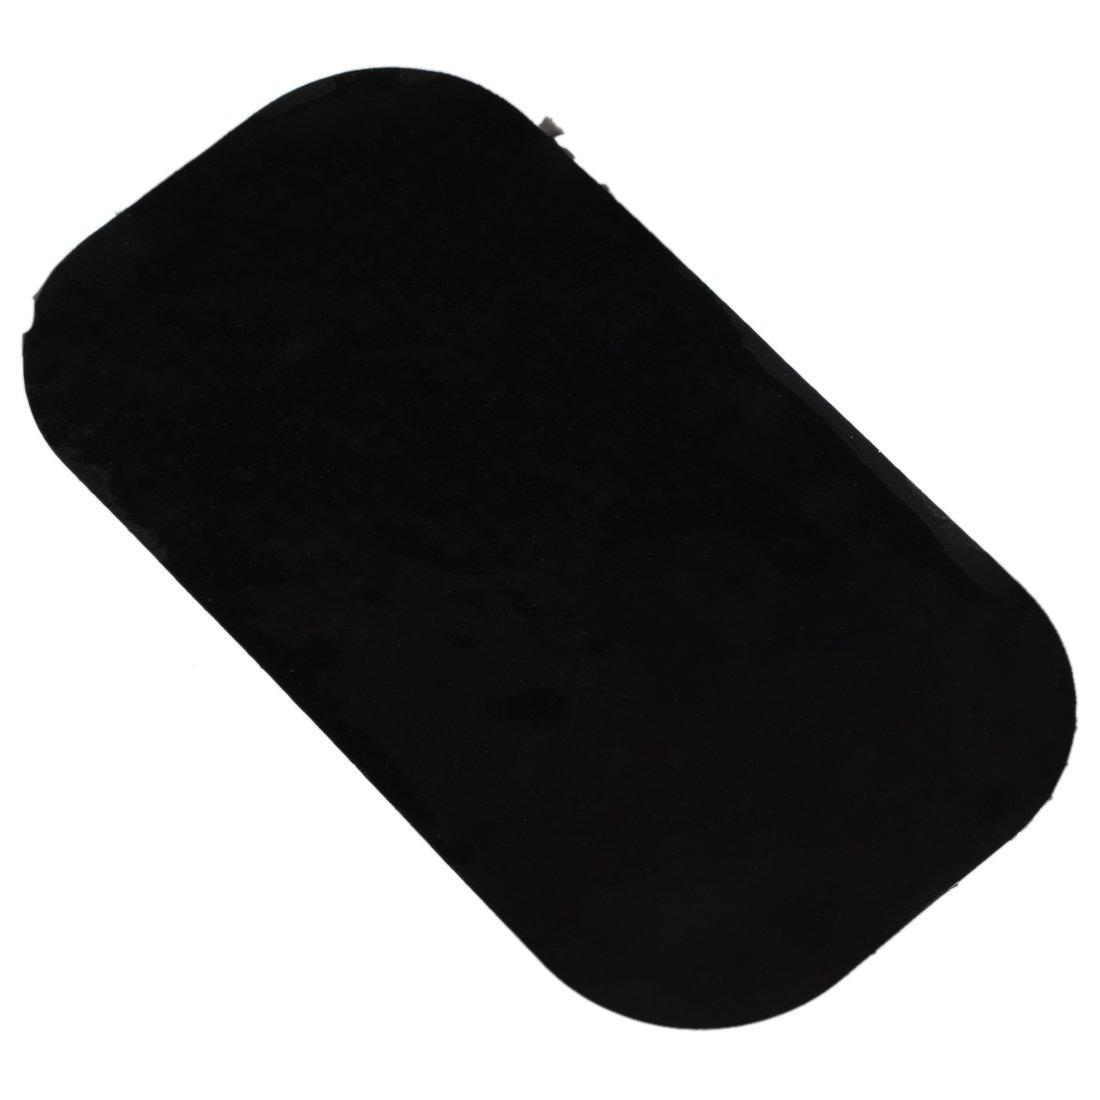 SODIAL(R) ALFOMBRILLA ANTIDESLIZANTE ADHESIVA SALPICADERO COCHE PARA iPod Touch 2 3 4 4G: Amazon.es: Electrónica